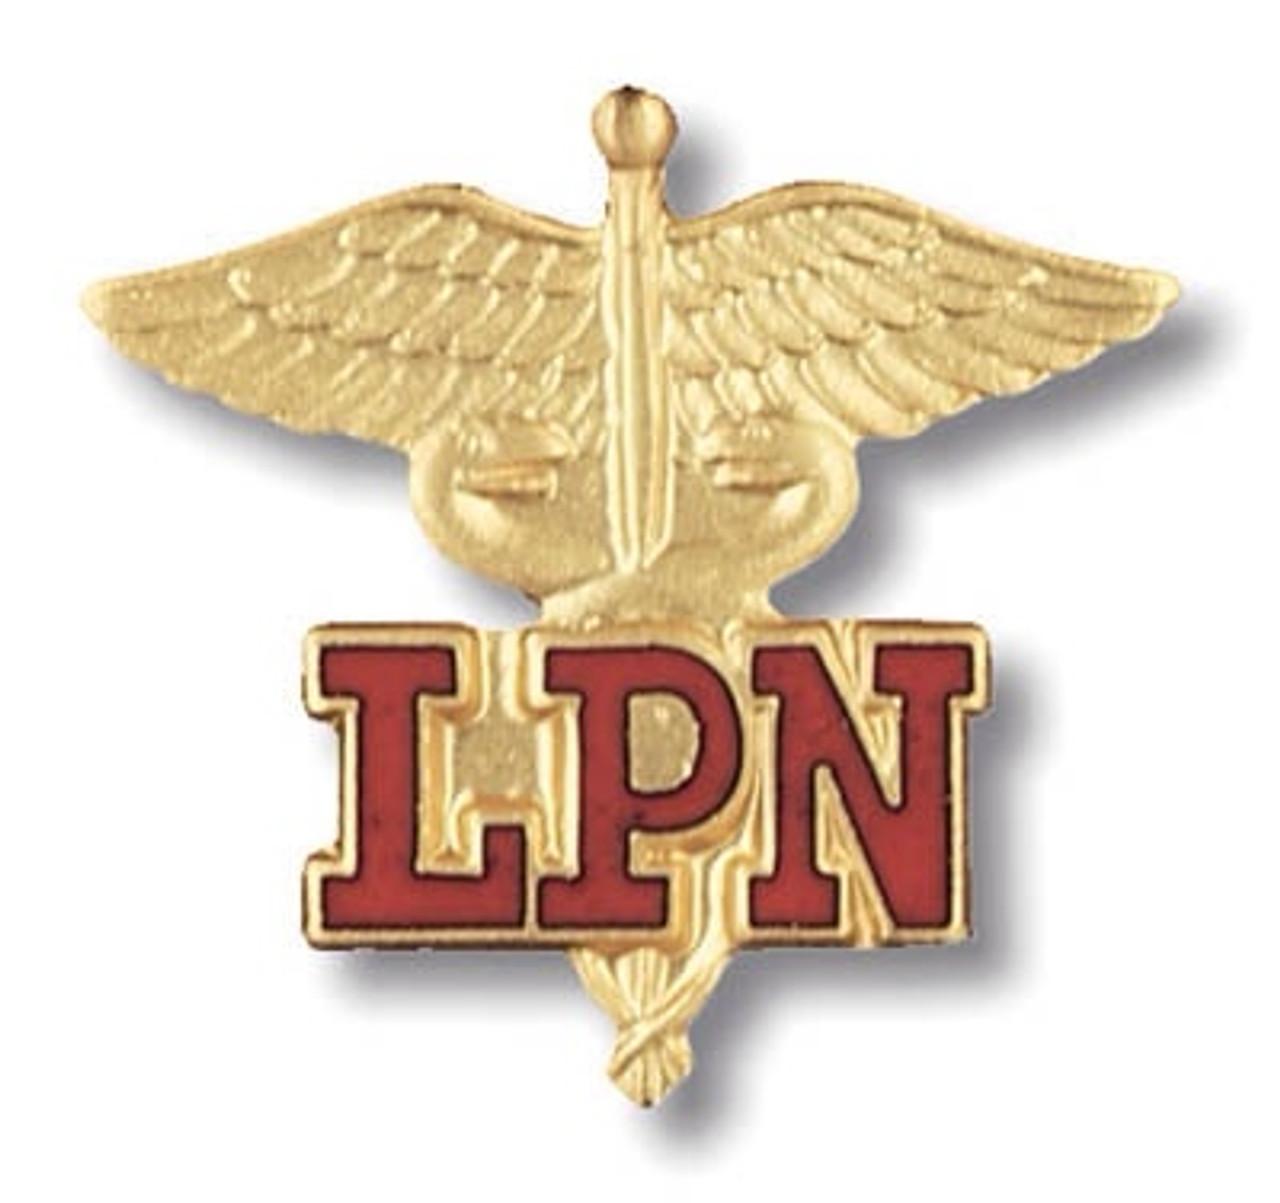 LPN red (Licensed Practical Nurse) Caduceus Emblem Pin